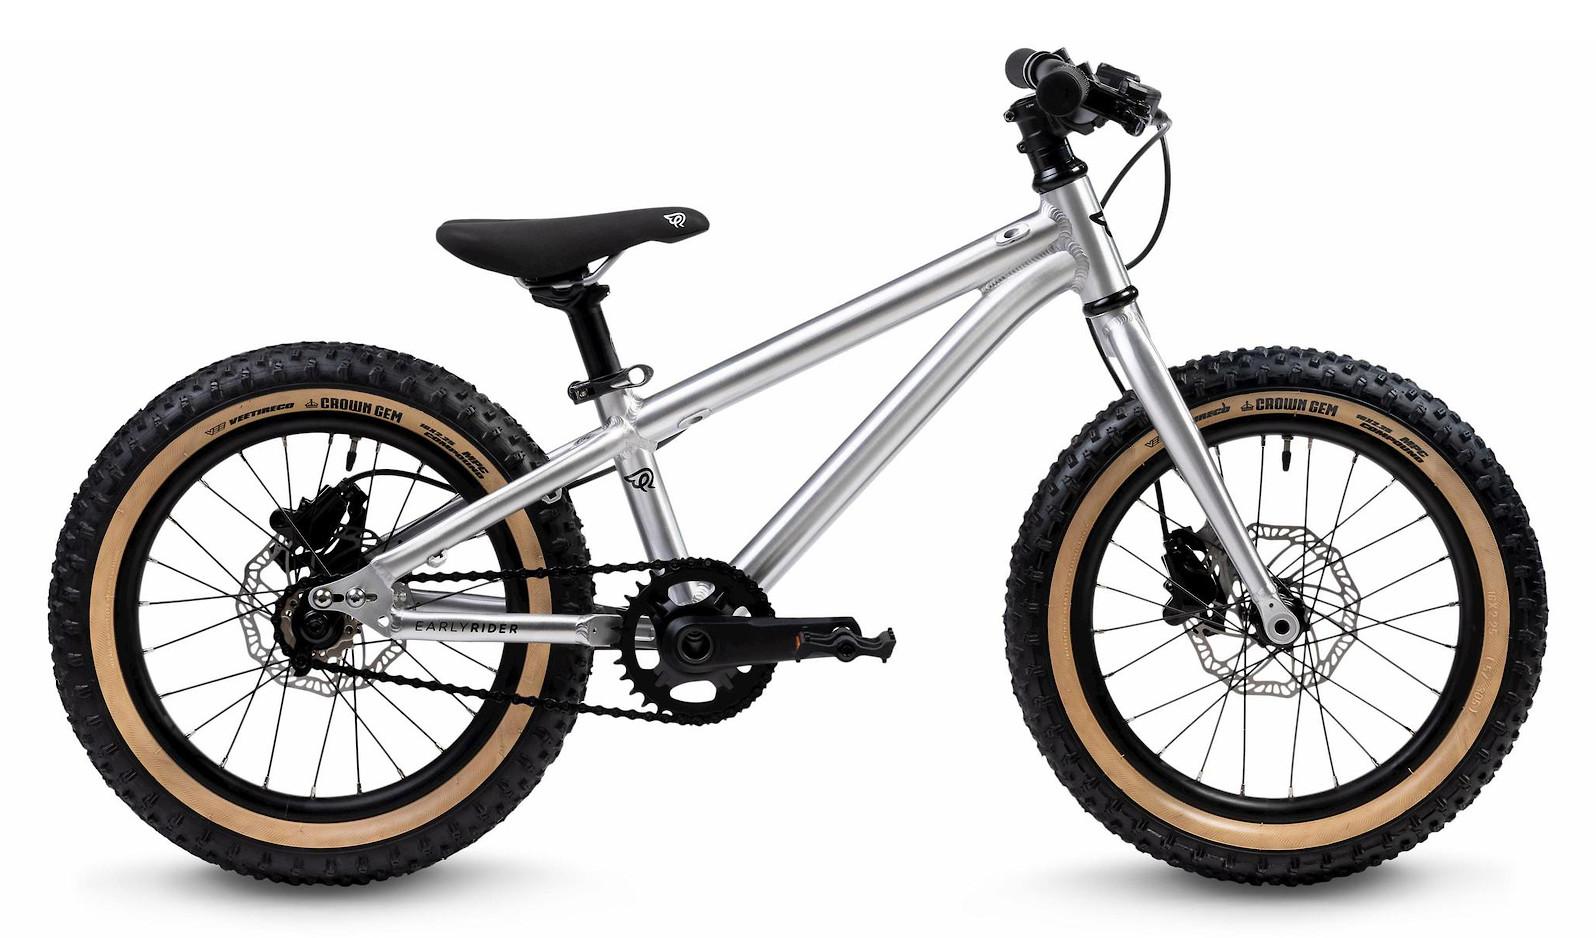 2020 Early Rider Hellion 16